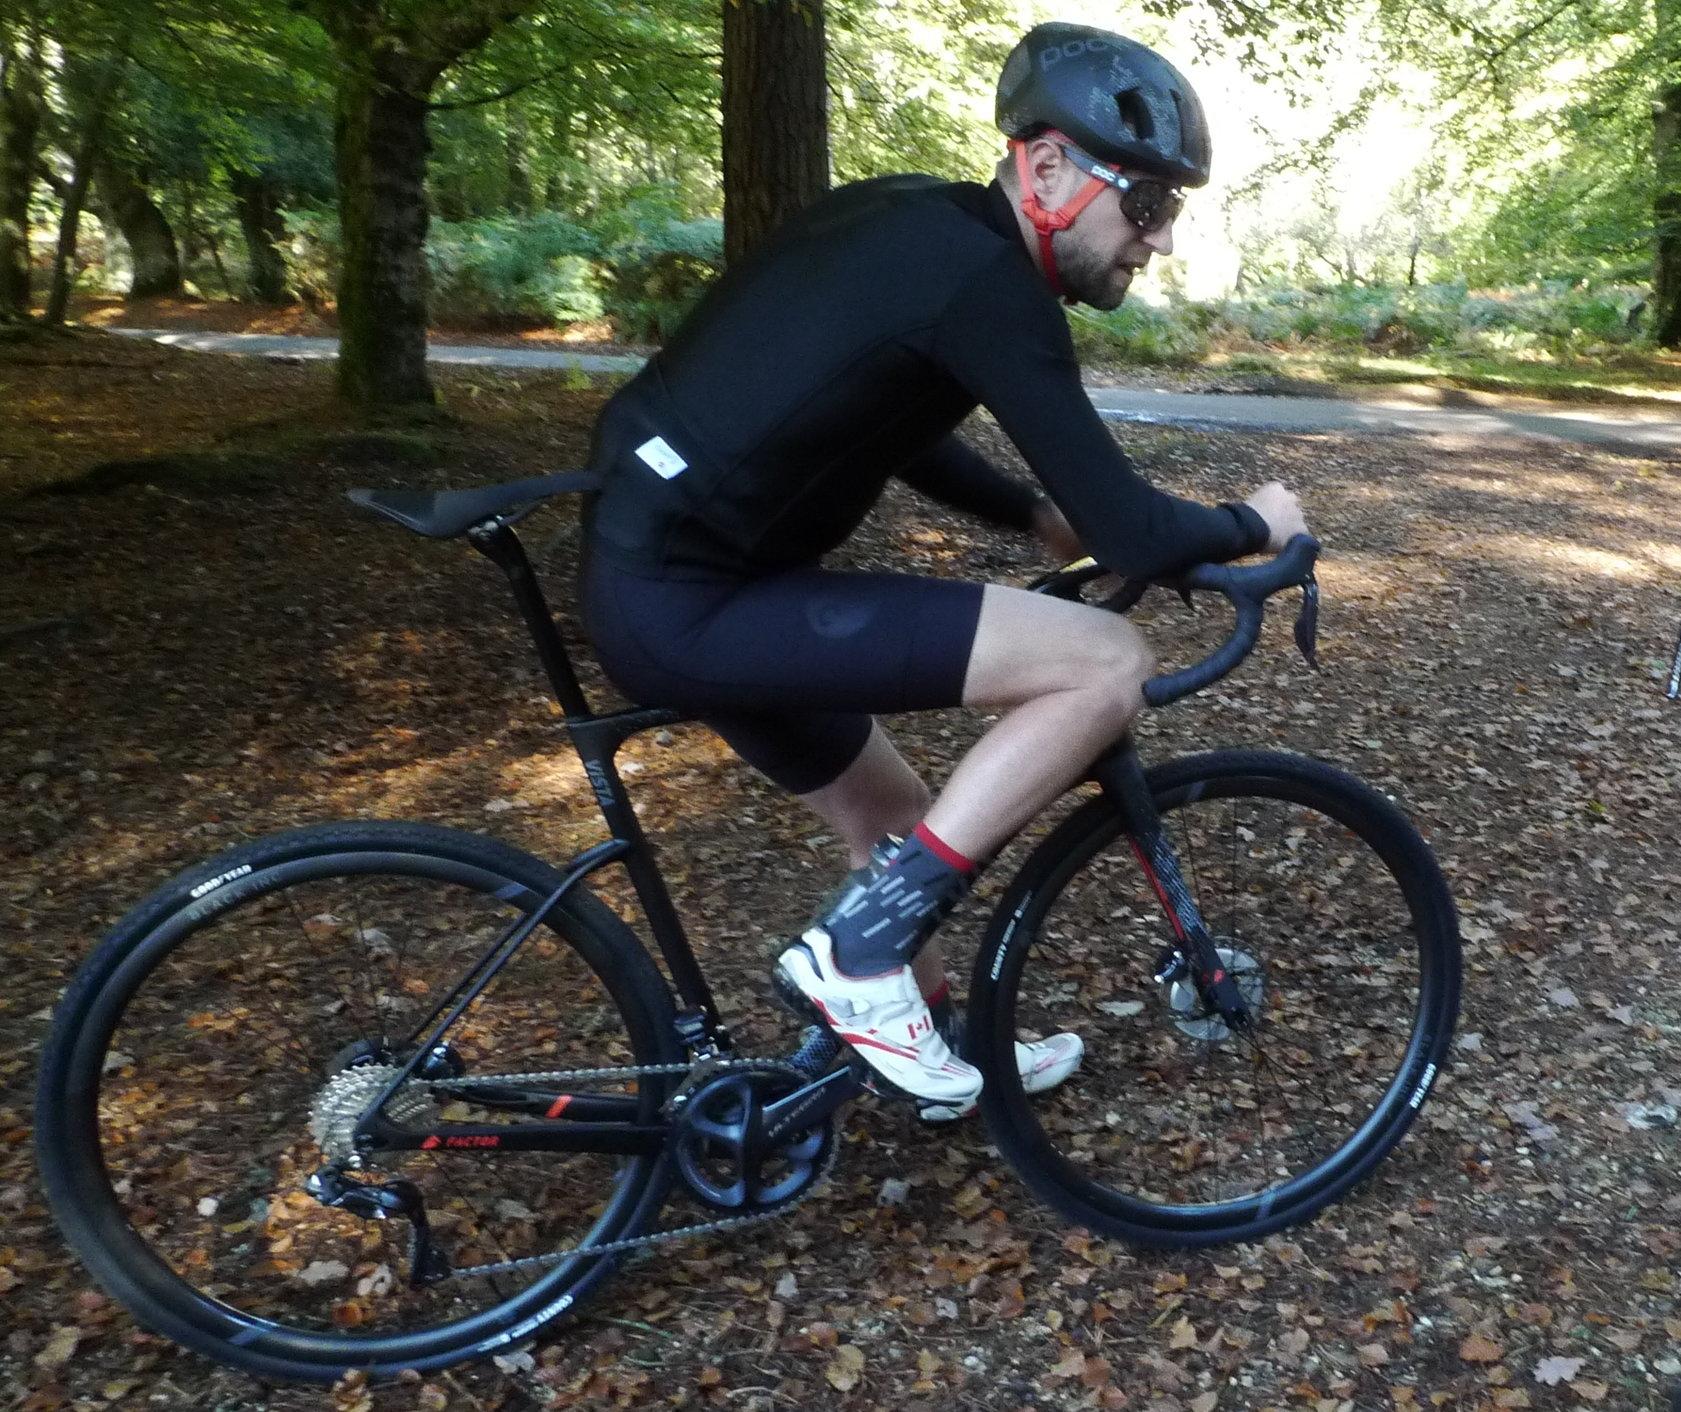 Chpt3 ambassador Ryder Hesjedal rides the new Factor Vista